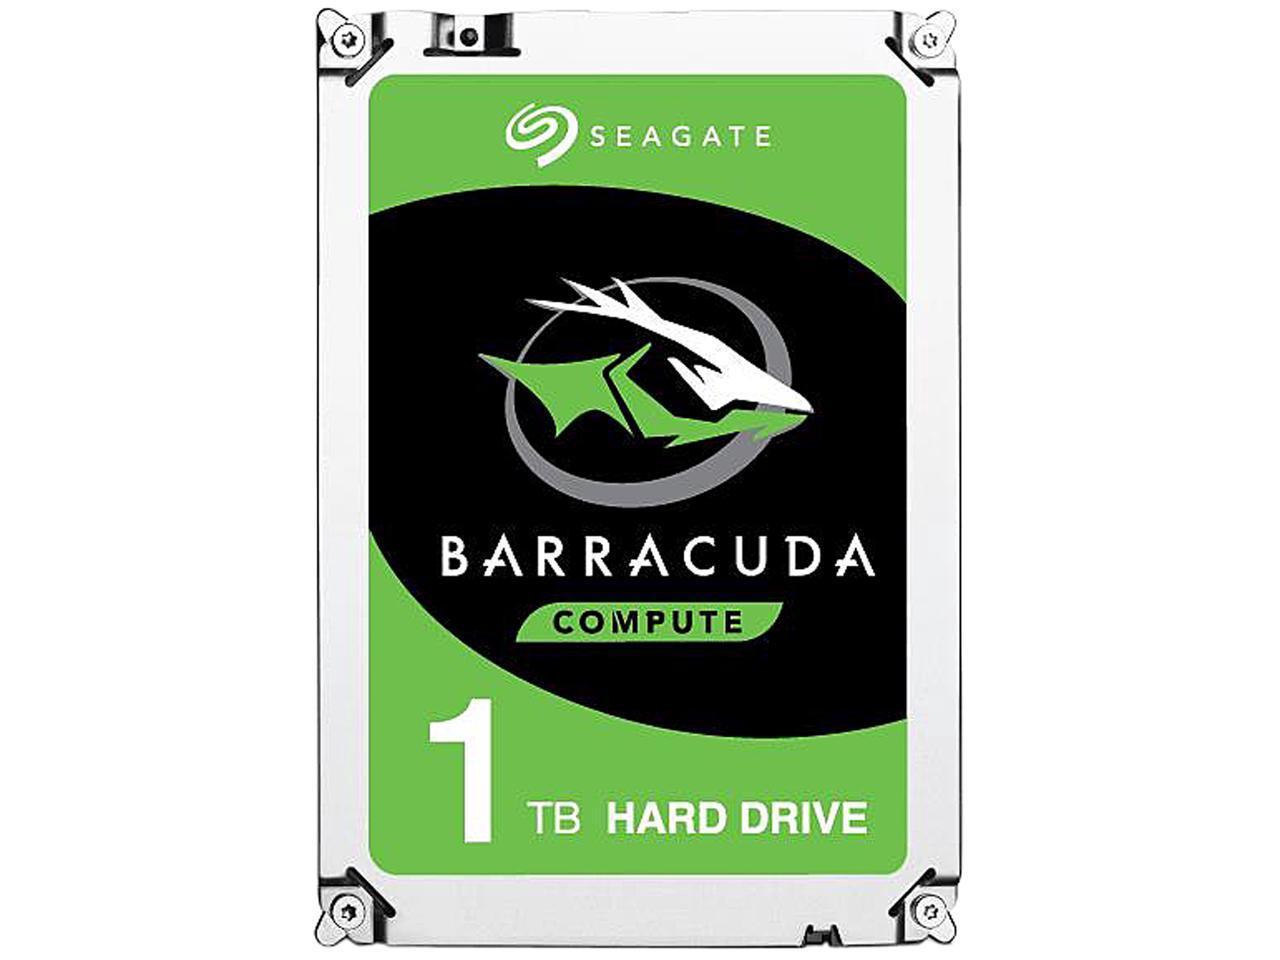 "Seagate BarraCuda 1TB 64MB Cache 3.5"" Hard Drive Bare Drive $42.99"